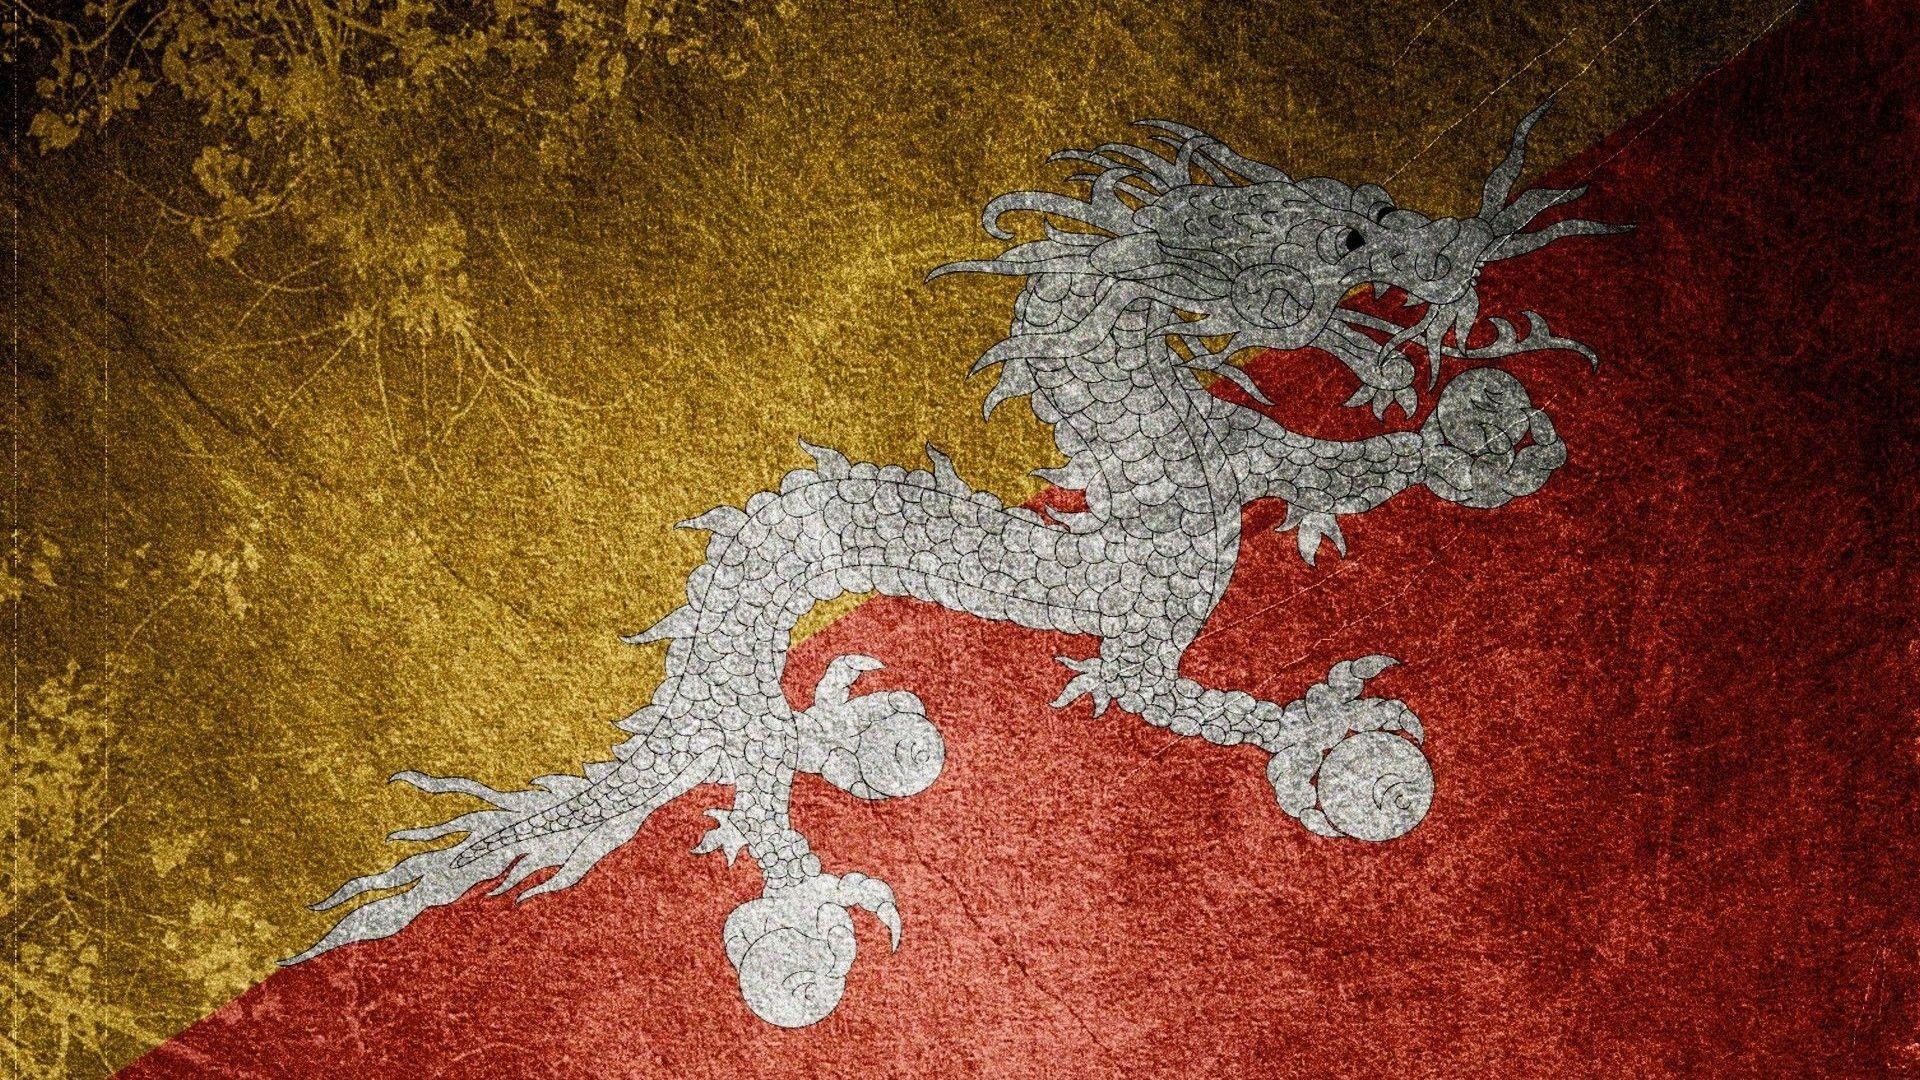 Japanese Dragon – Wallpapers – yoyowall.com